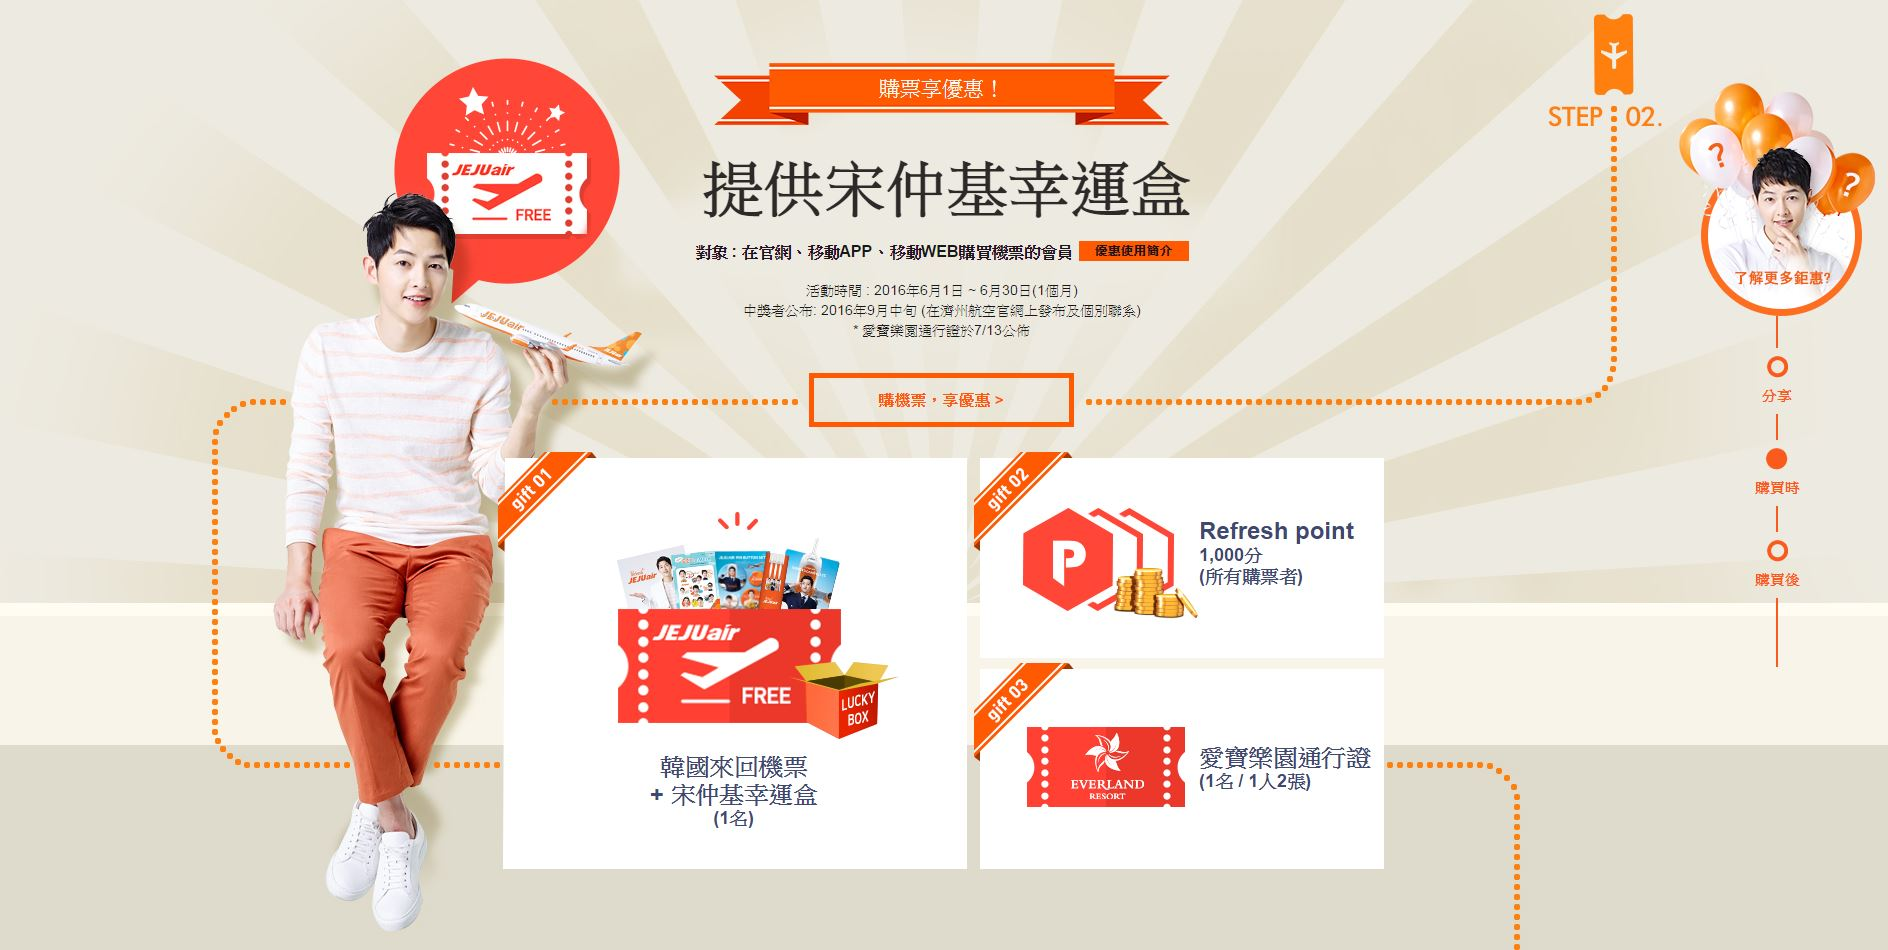 jeju-air-pick-me-up-sales-air-cheap-ticket-sale-summer-campaign-korea-travel (3)